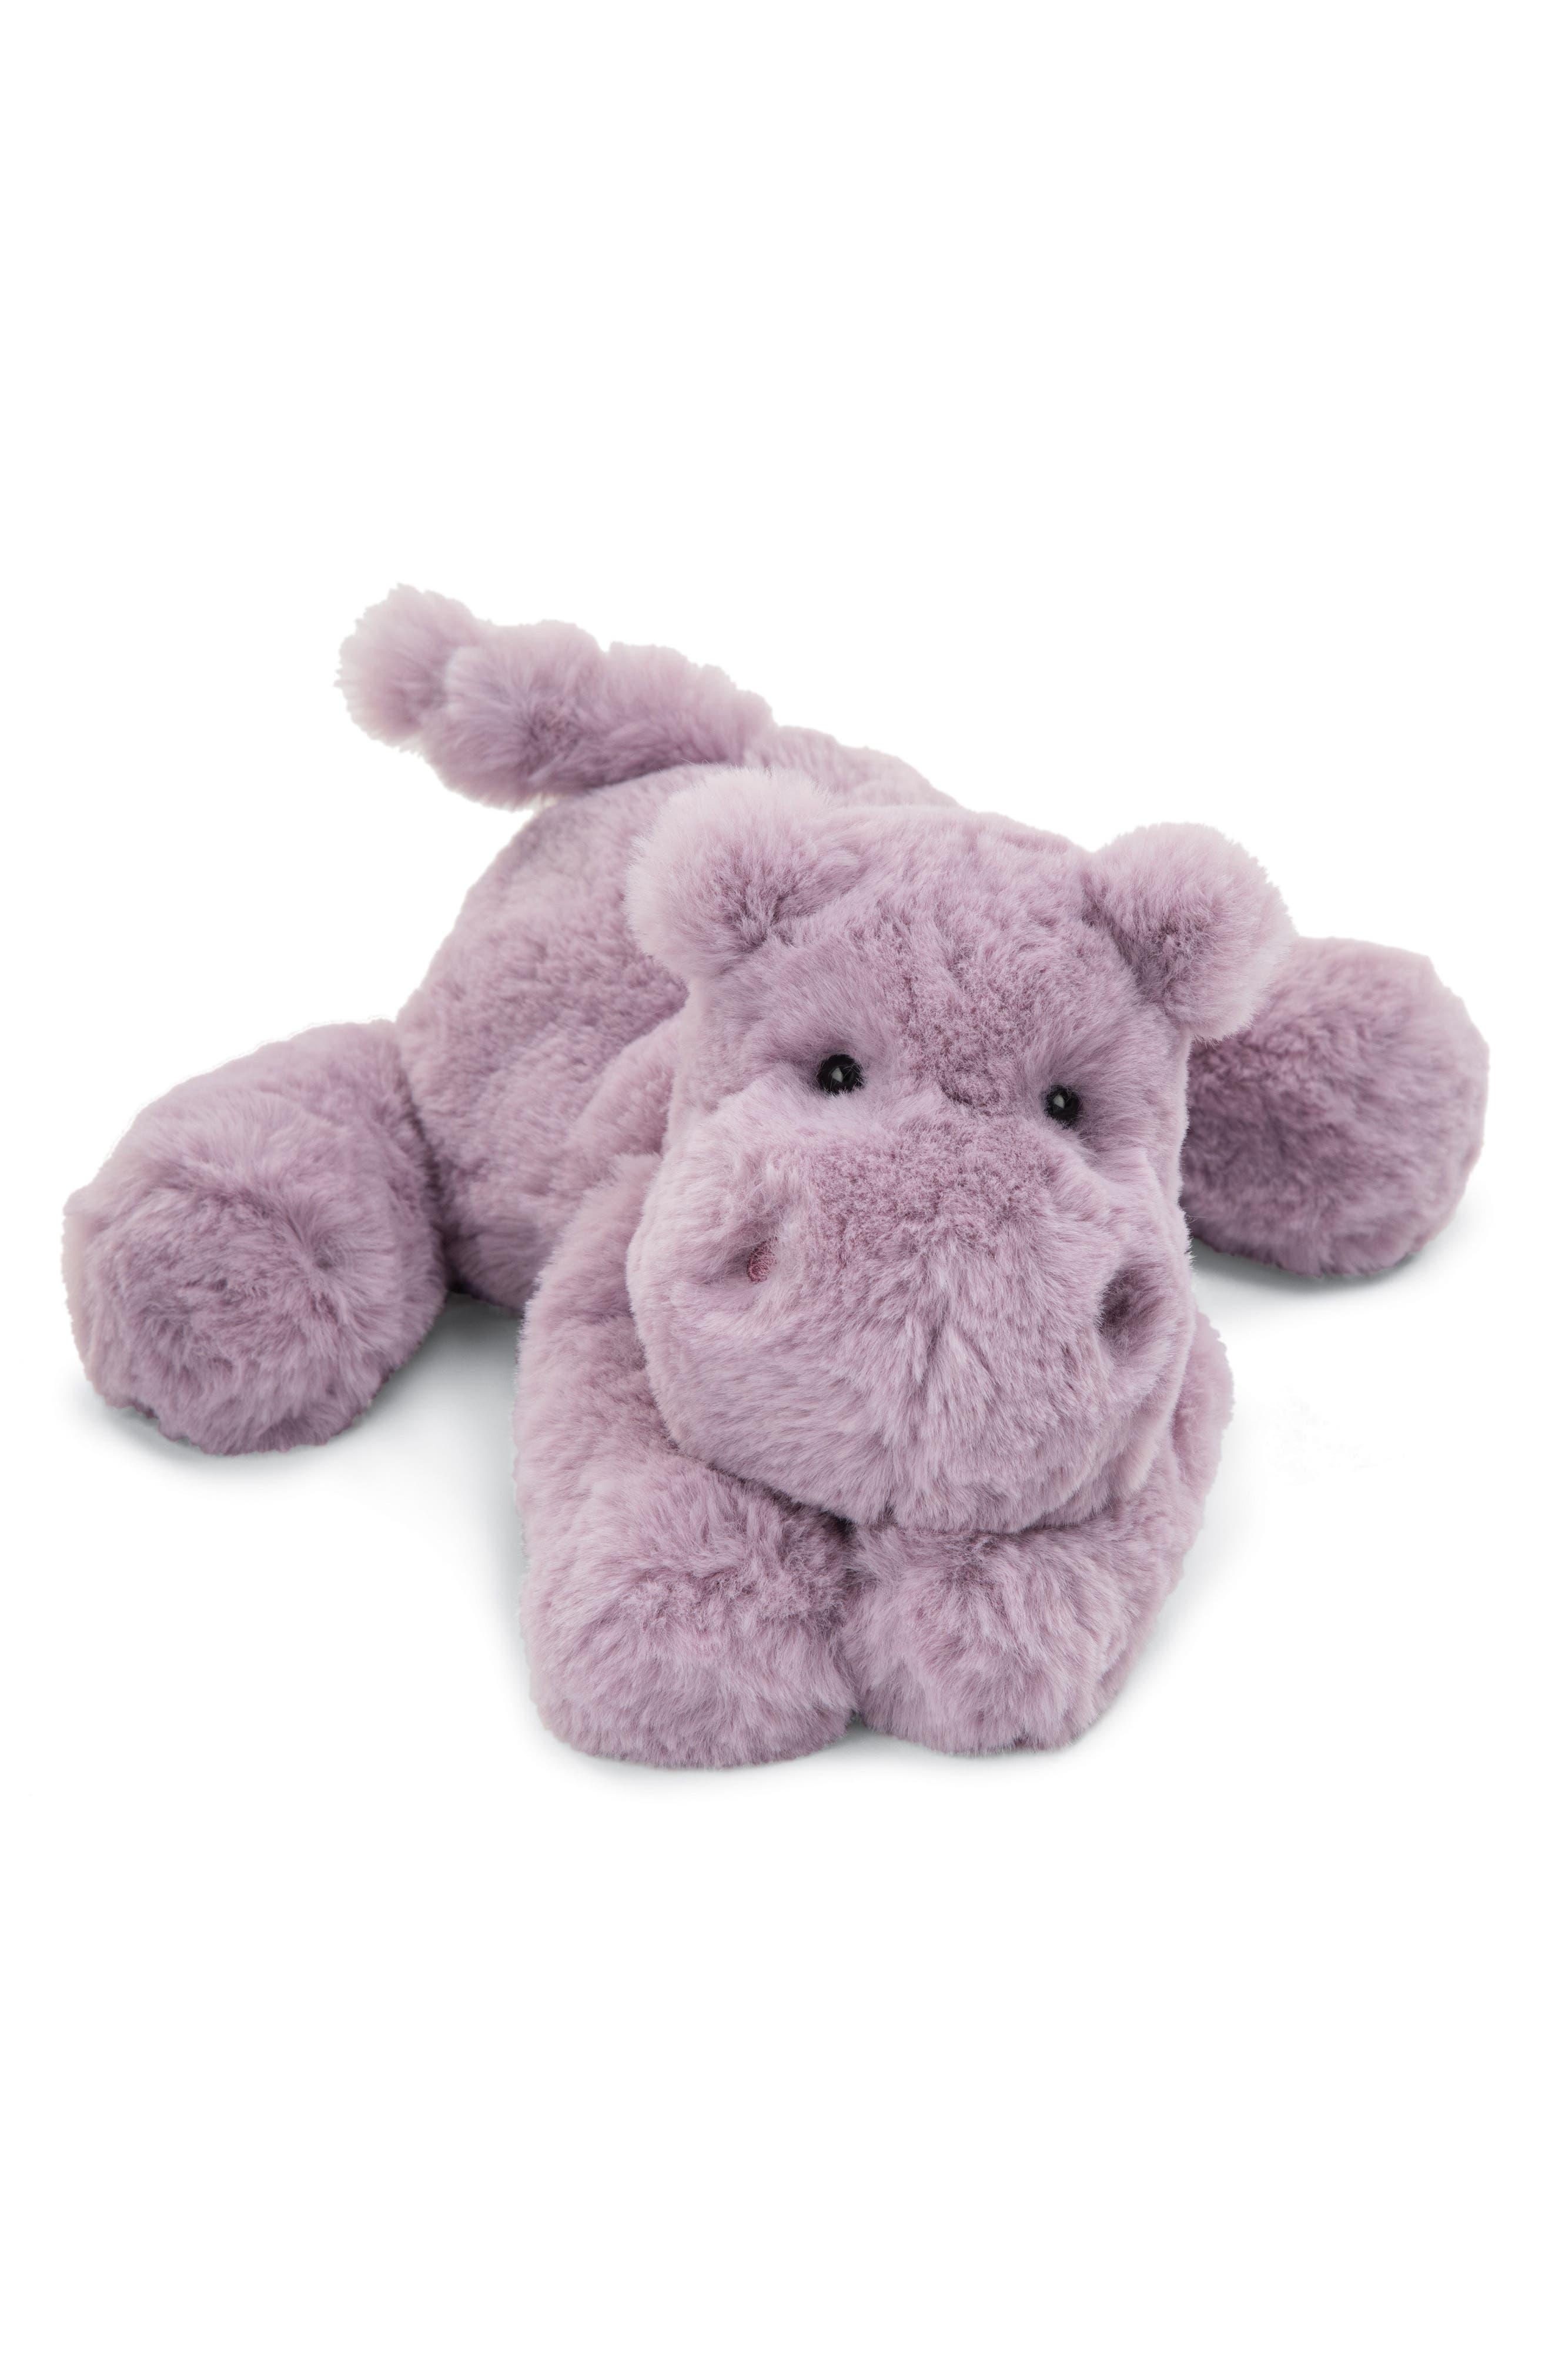 Smudge Hippo Stuffed Animal,                         Main,                         color, Lilac